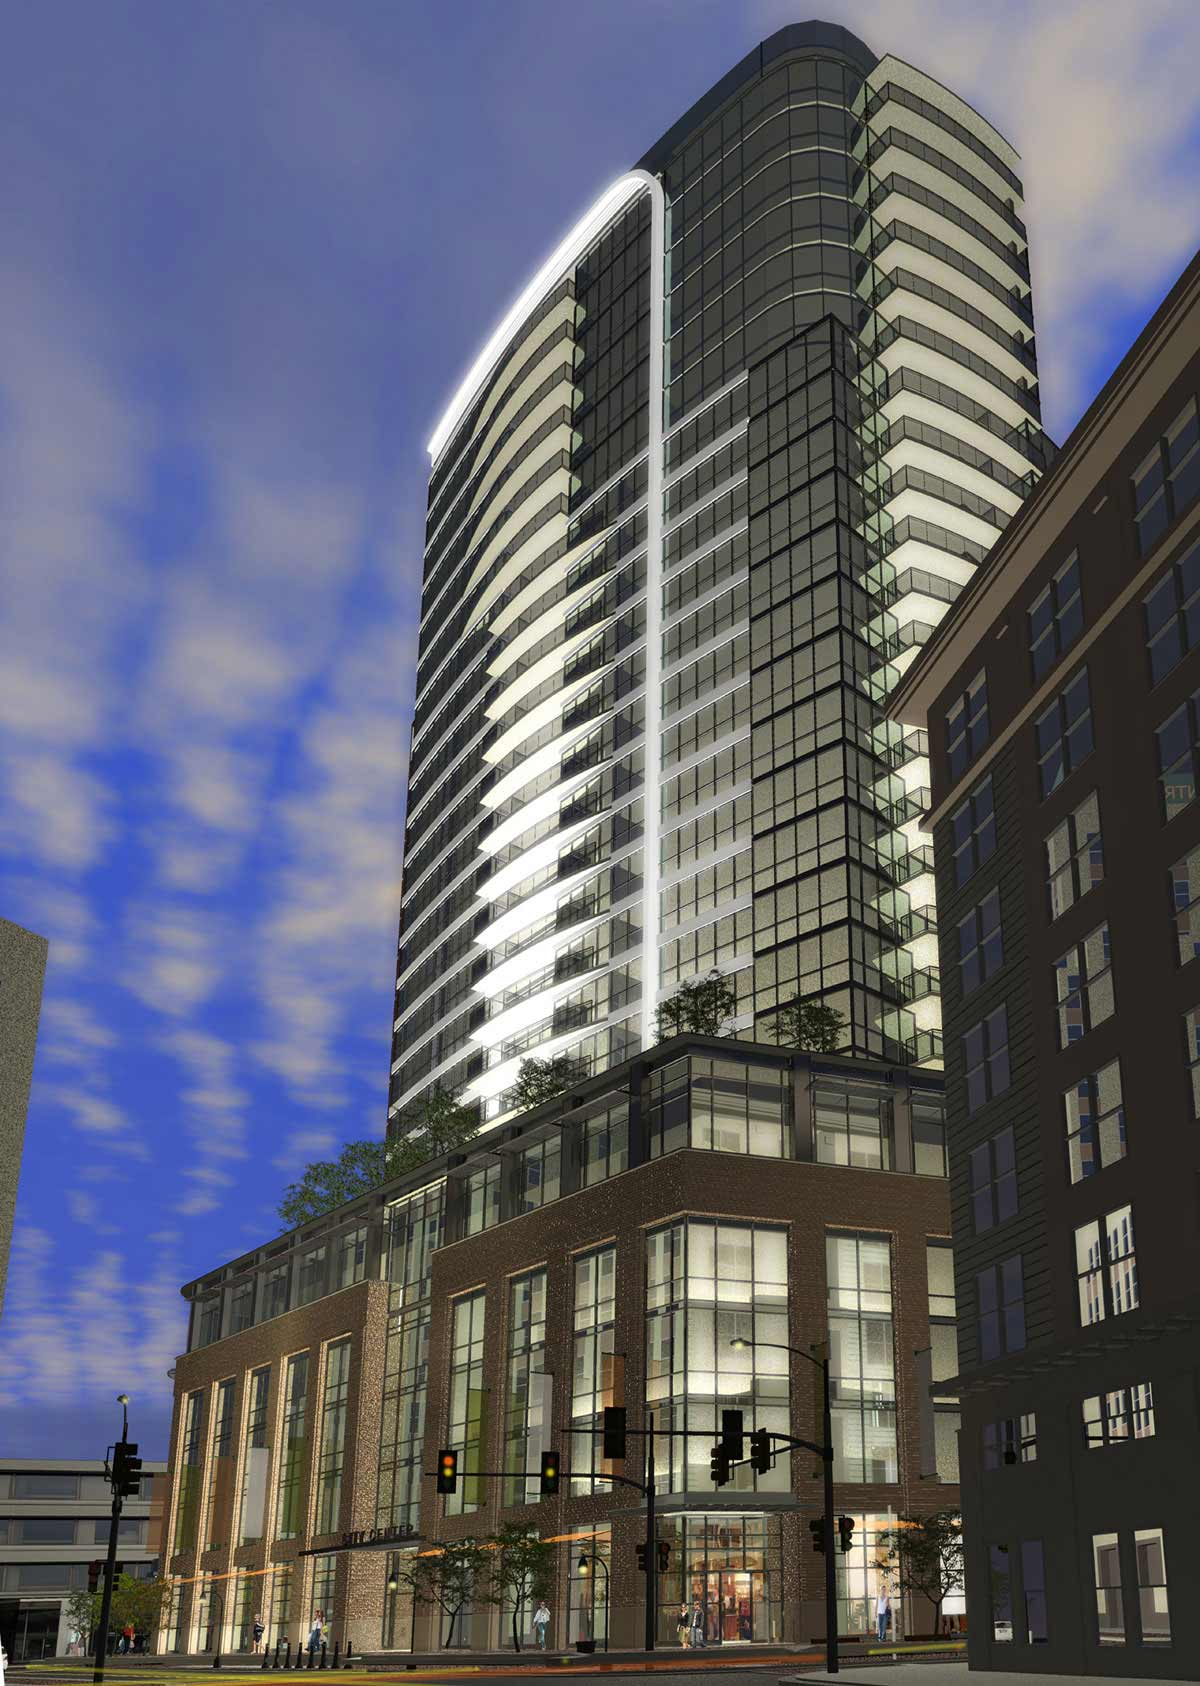 31b_Durham City Center_Exterior3.jpg